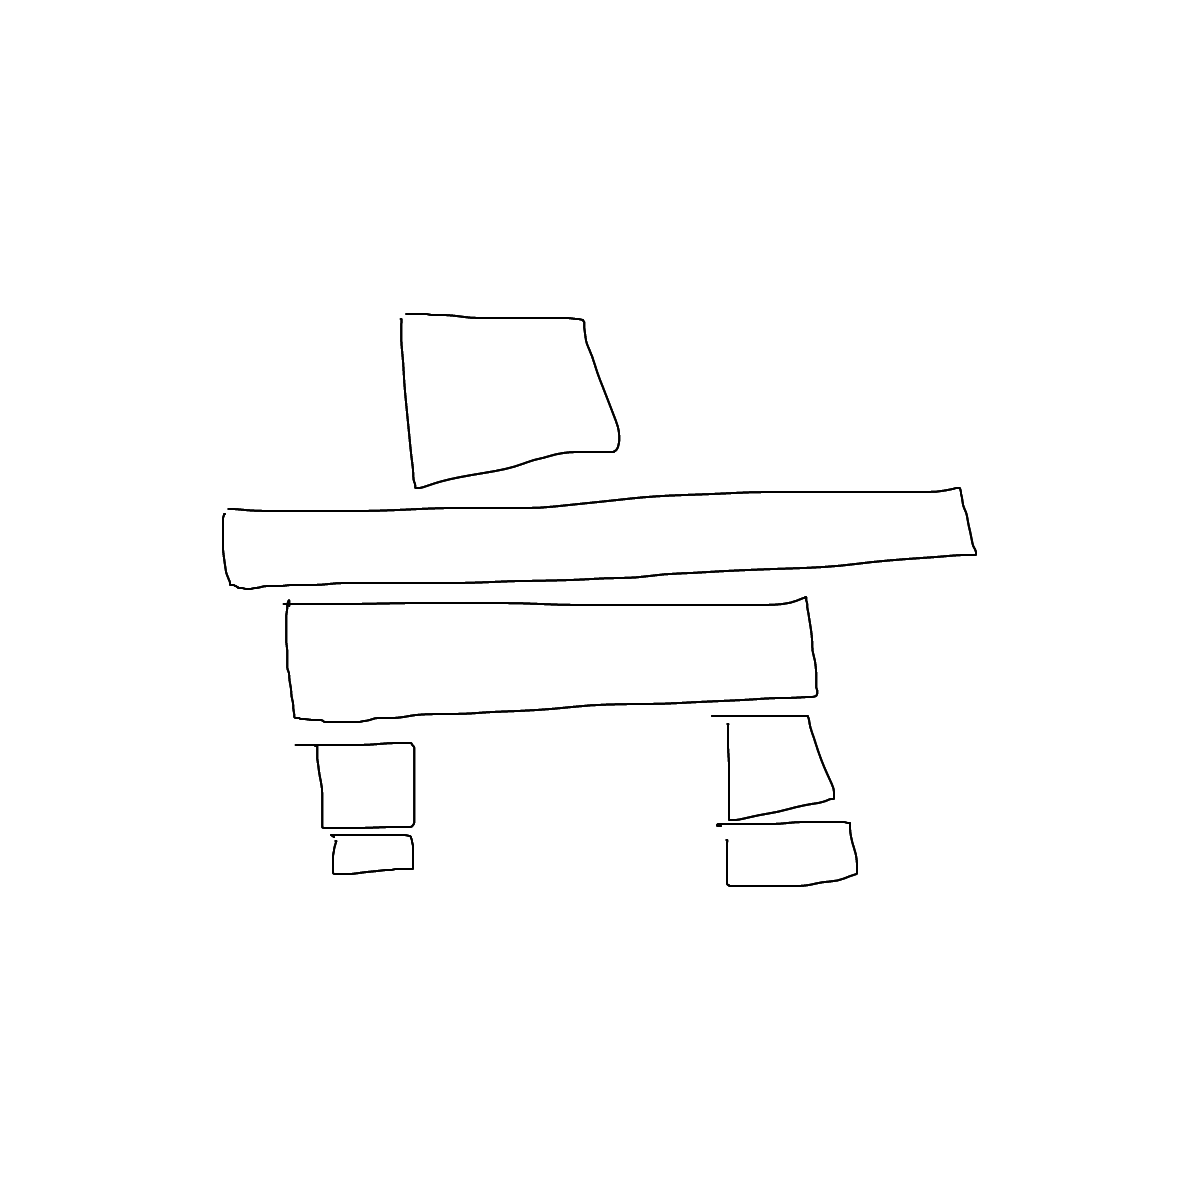 BAAAM drawing#17318 lat:73.2317504882812500lng: -80.1474914550781200